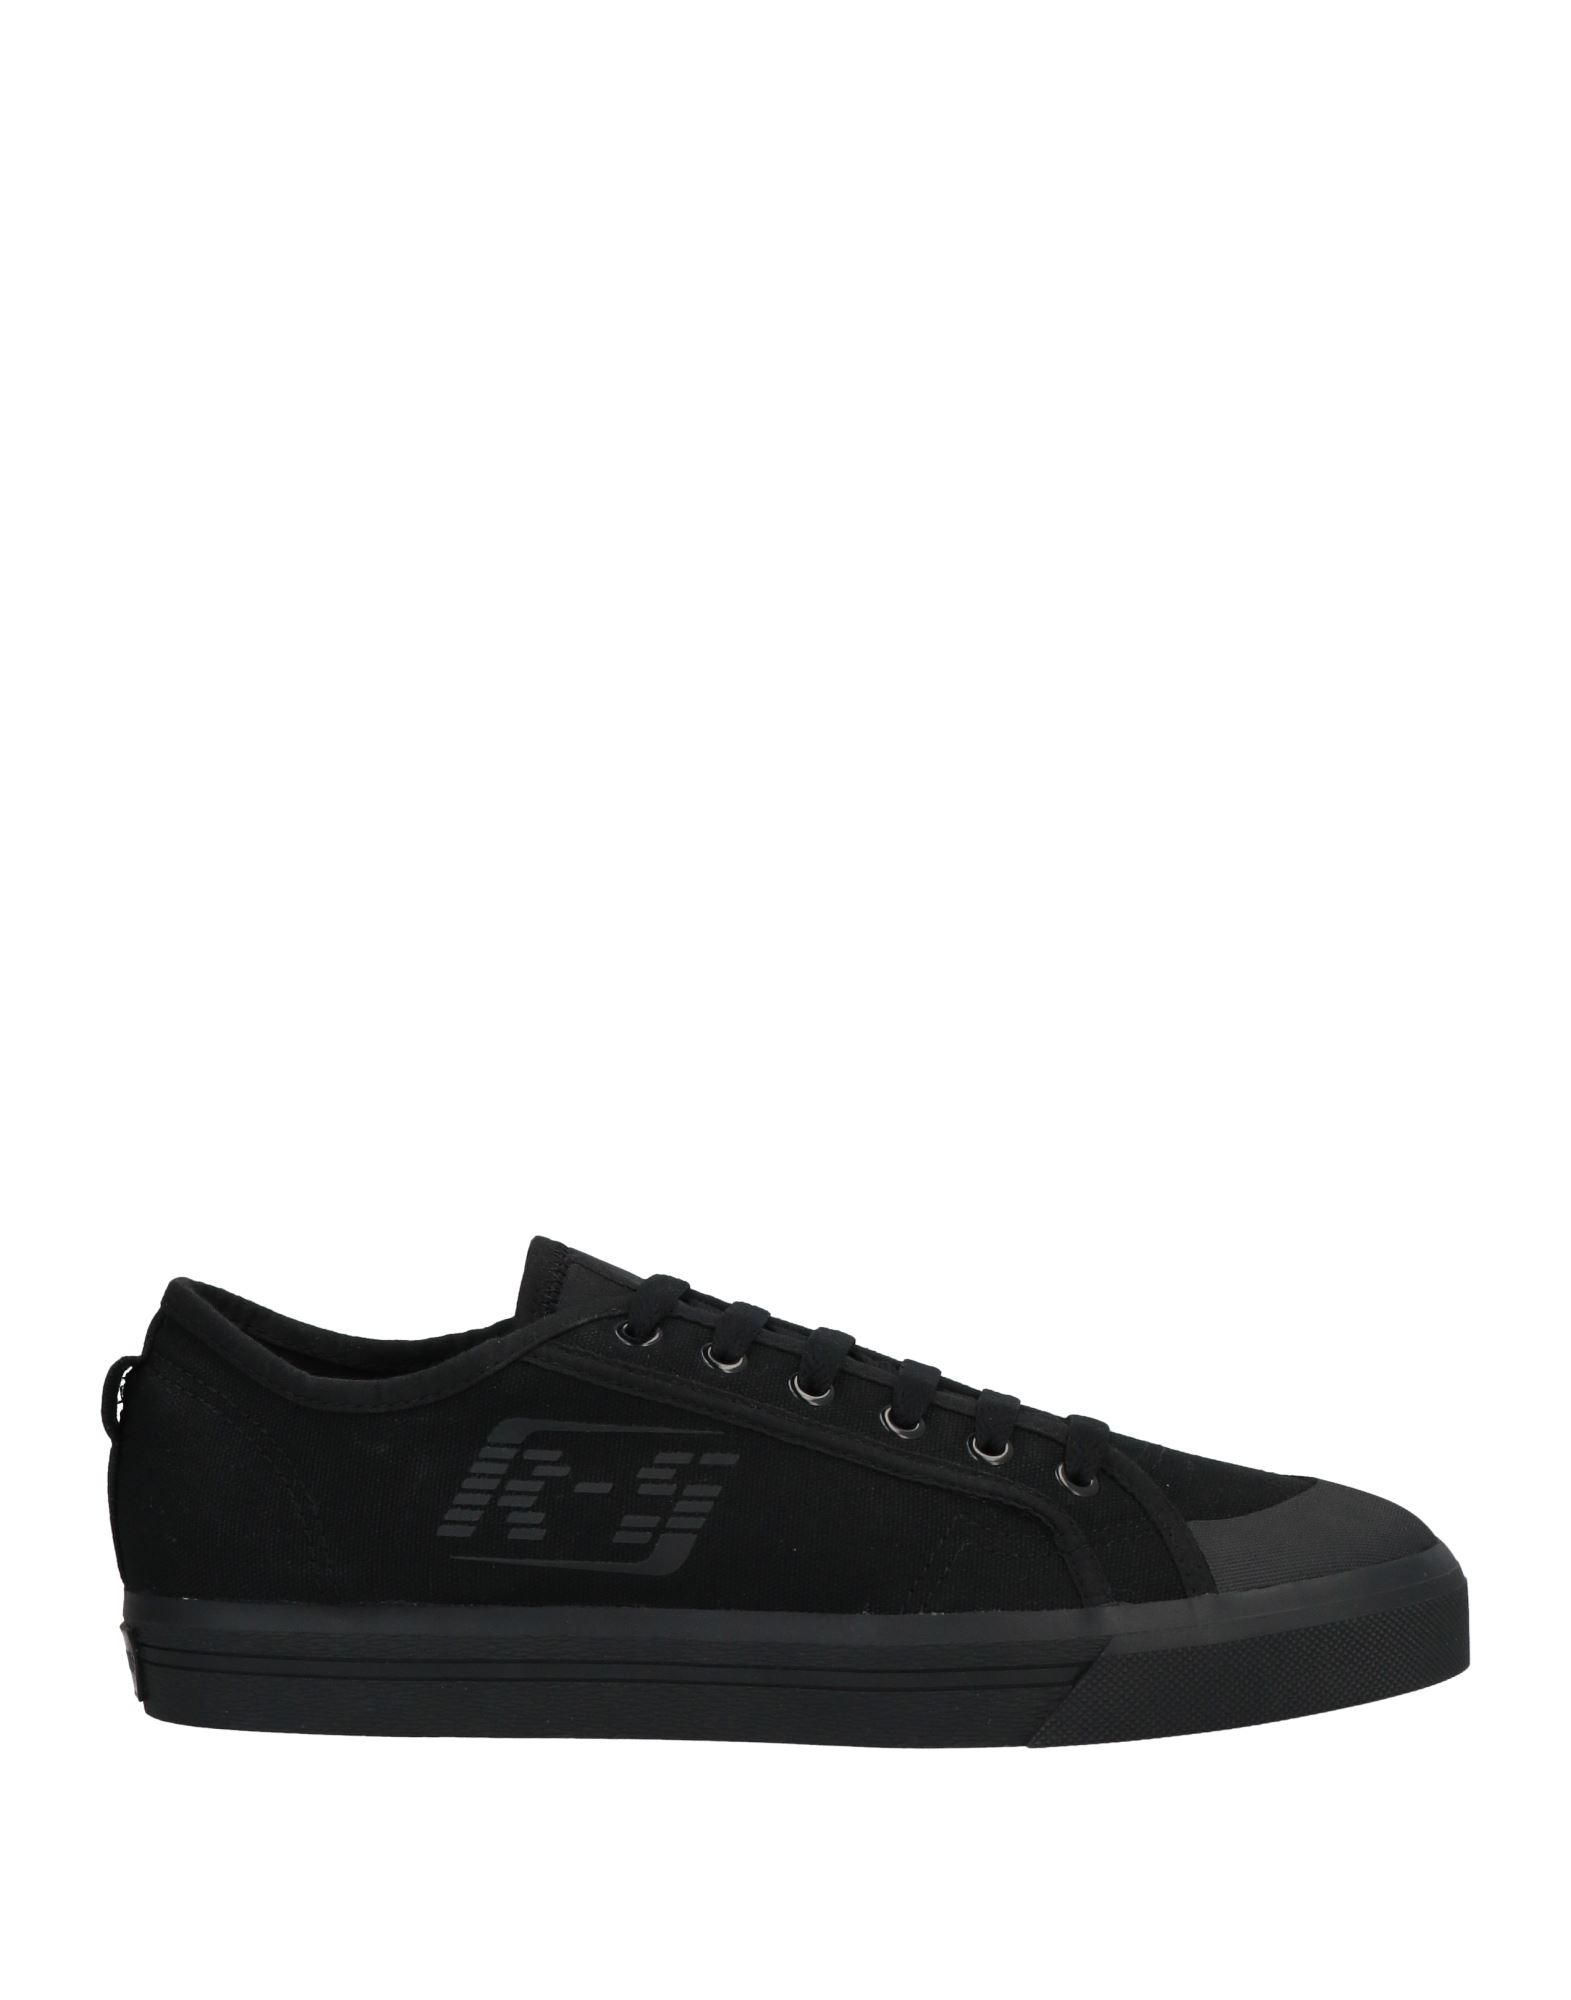 ADIDAS by RAF SIMONS Herren Low Sneakers & Tennisschuhe2 schwarz